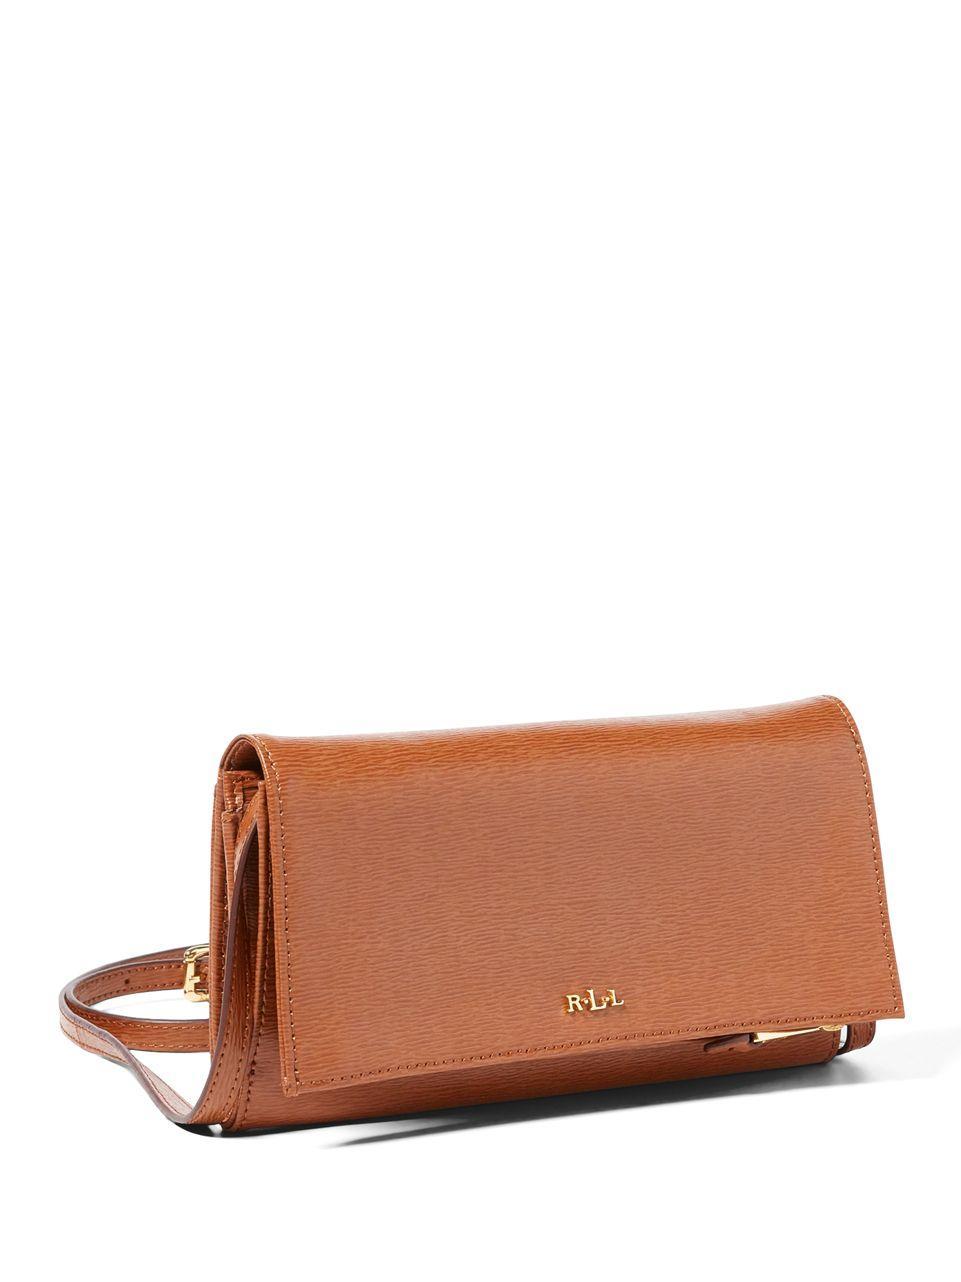 8824f88ee17e Lyst - Lauren by Ralph Lauren Newbury Mini Saffiano Leather ...